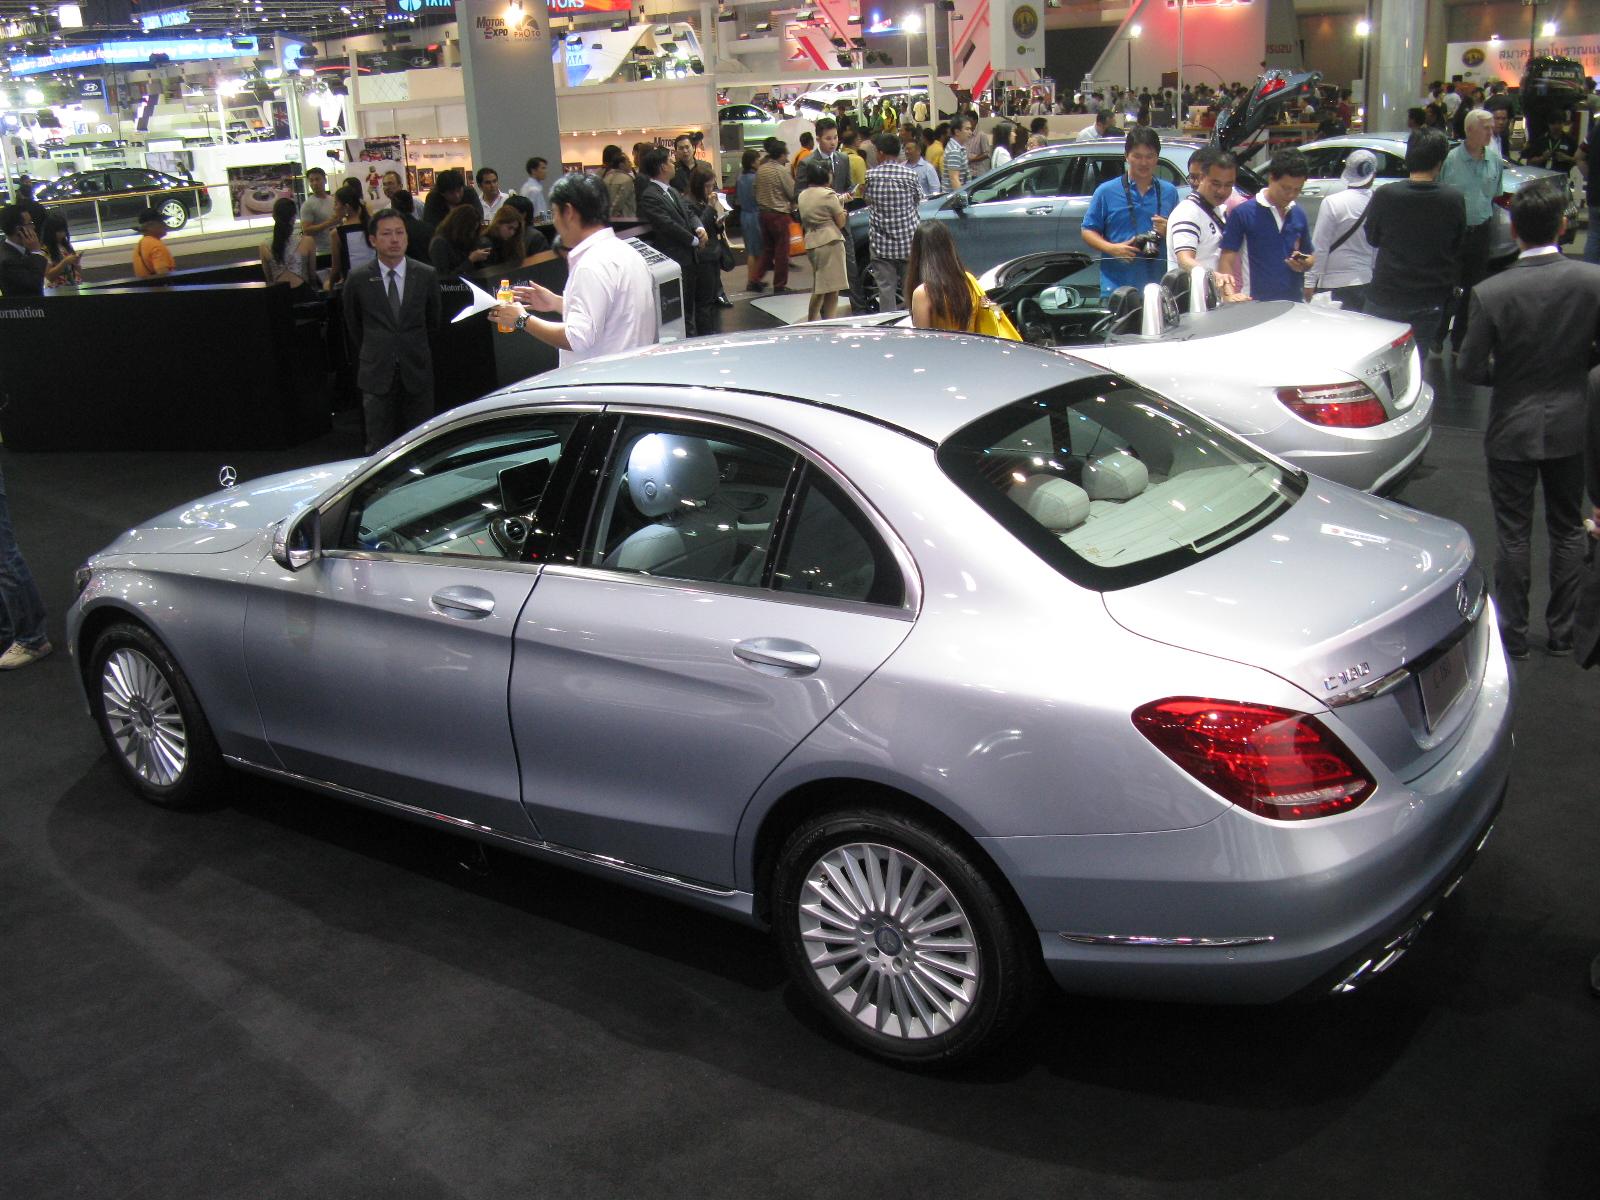 File Mercedes Benz C180 W205 16005105276 Jpg Wikimedia